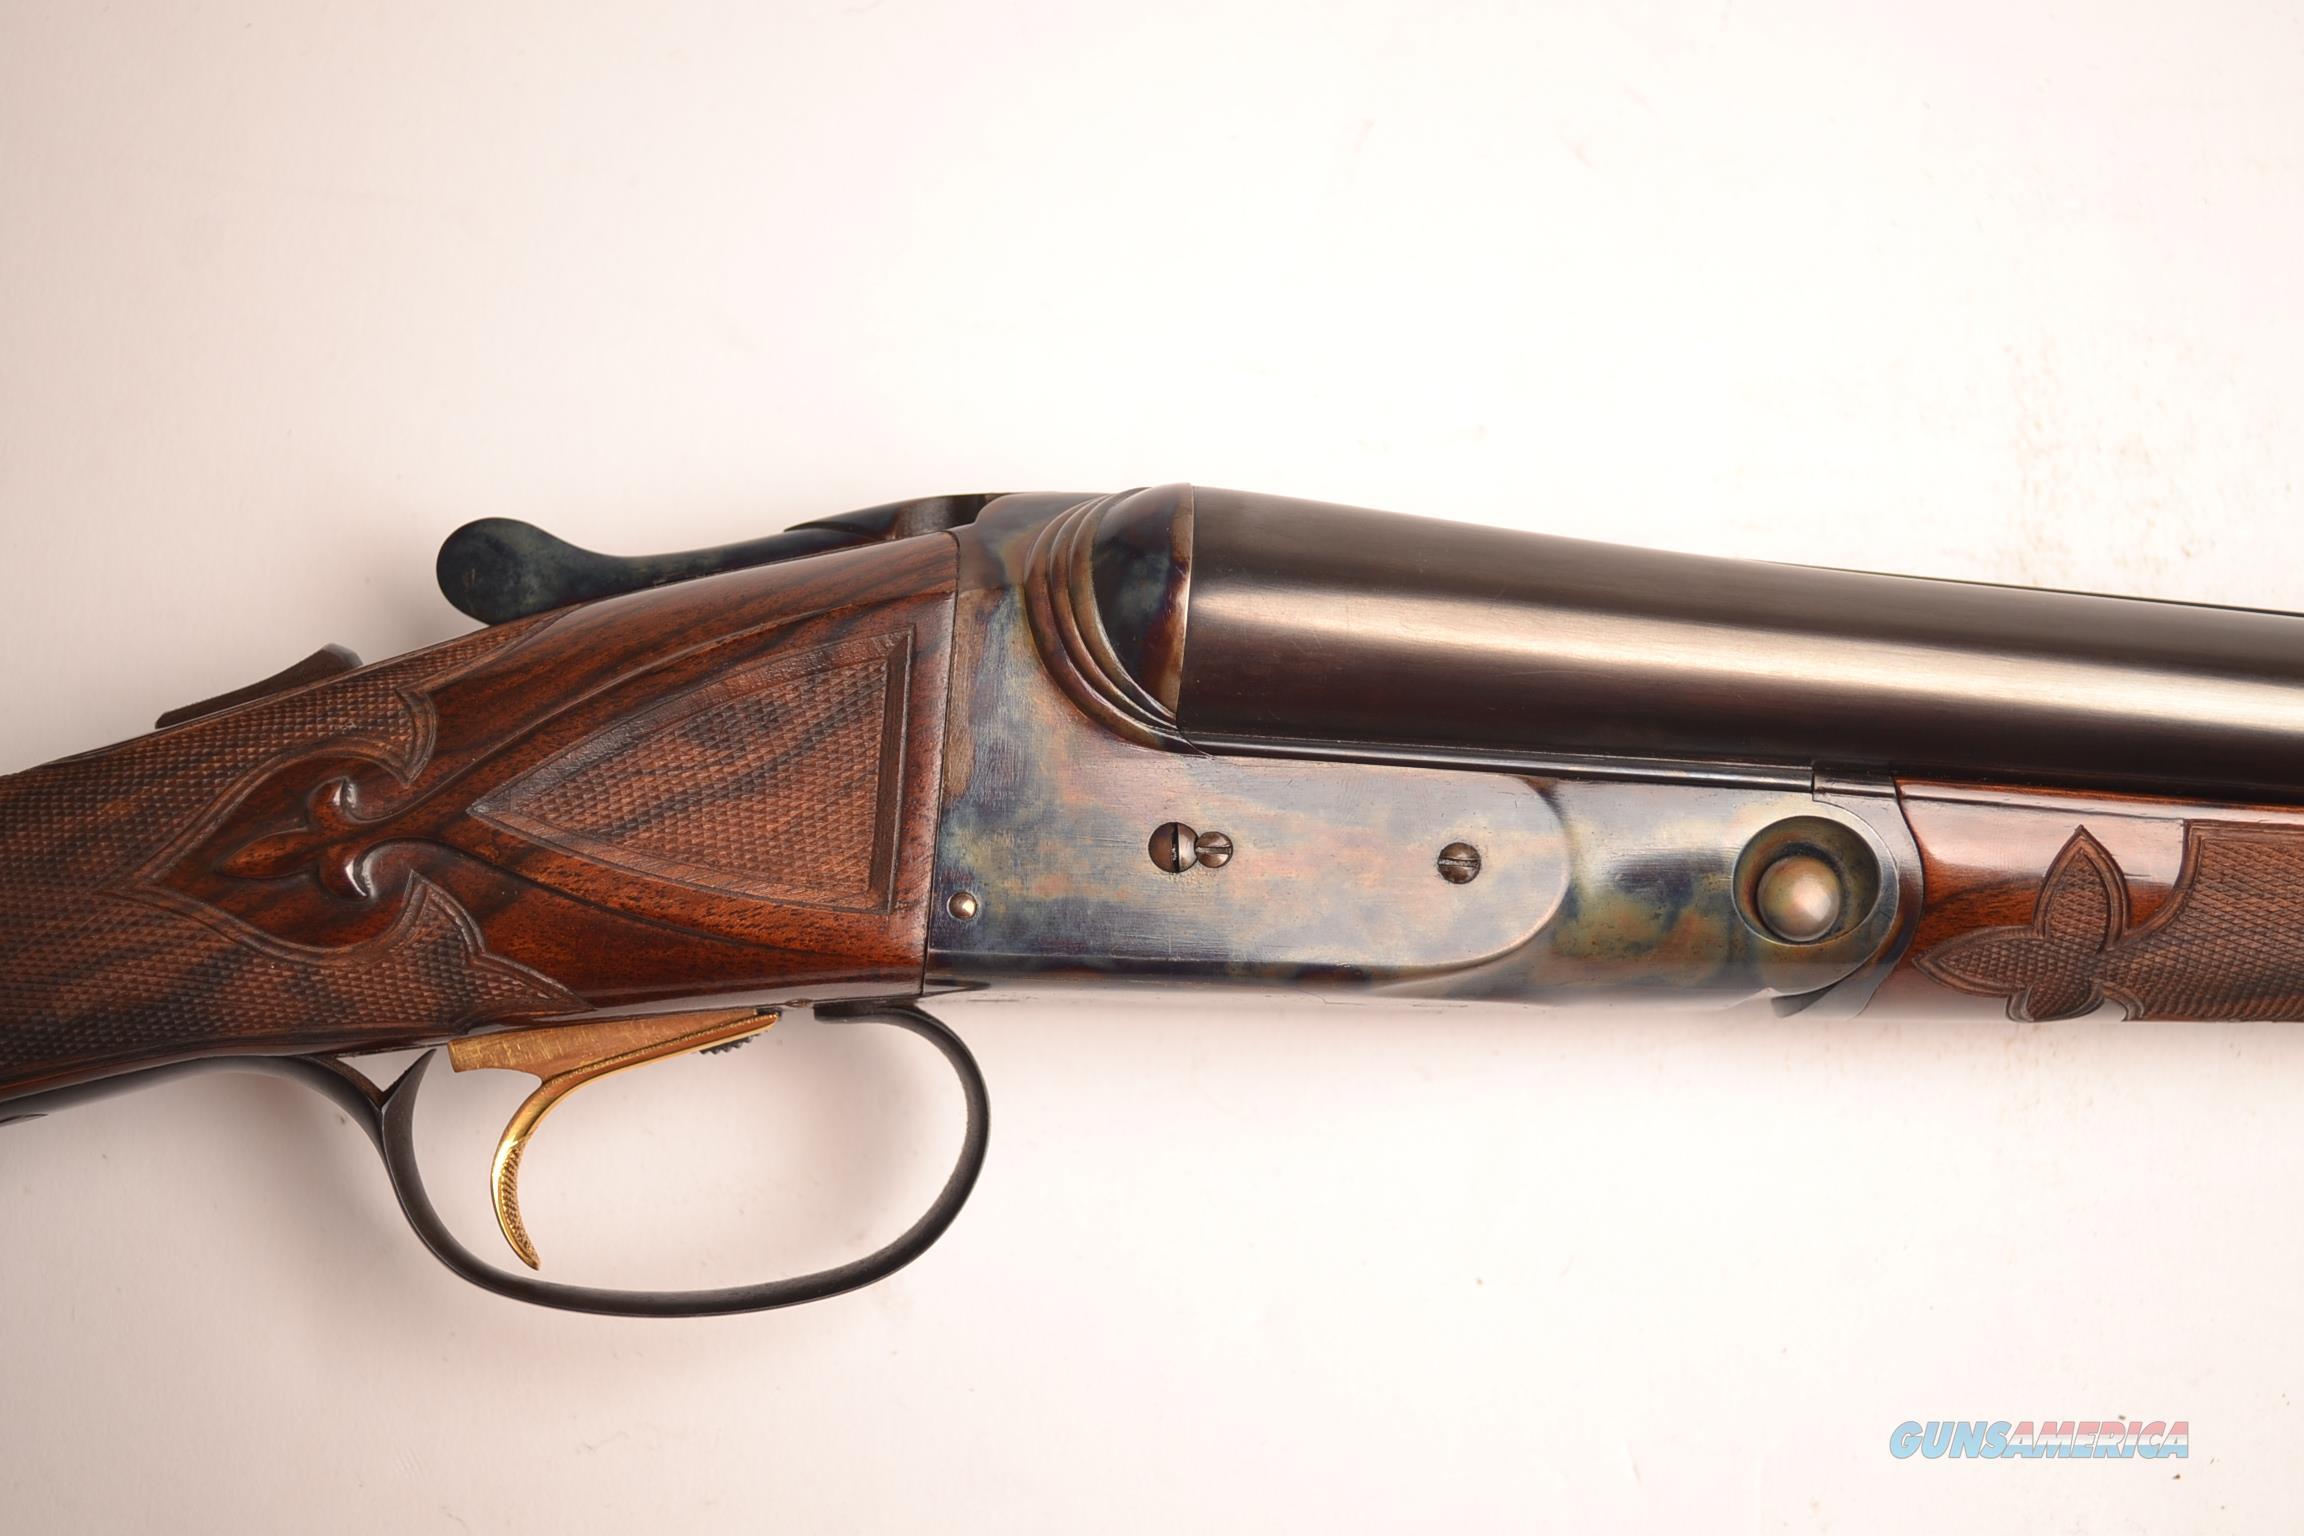 Parker Reproduction - A-1 Special, 12ga.  Guns > Shotguns > Parker Reproductions Shotguns